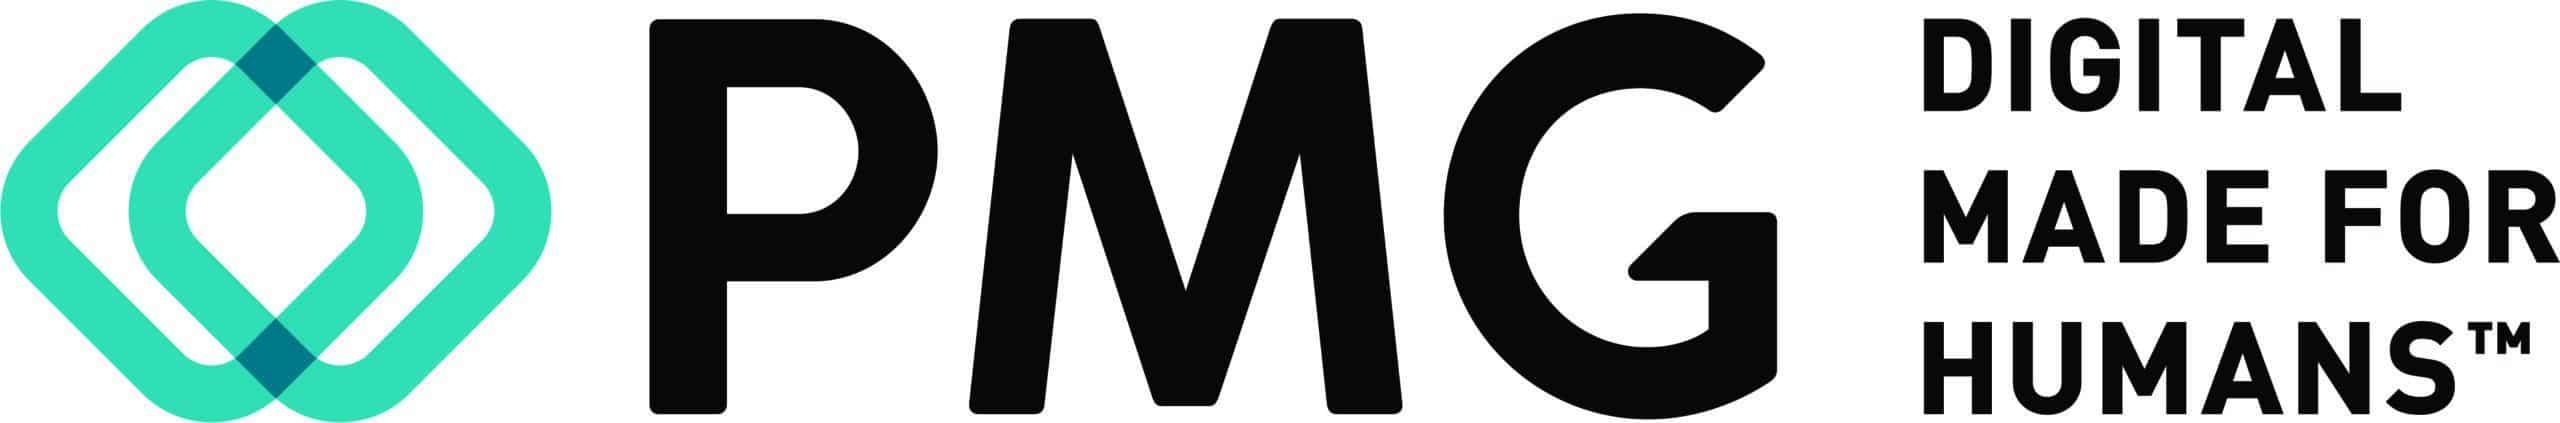 PMG_LogoTaglineLockup_CMYK_FullColor_RLSD